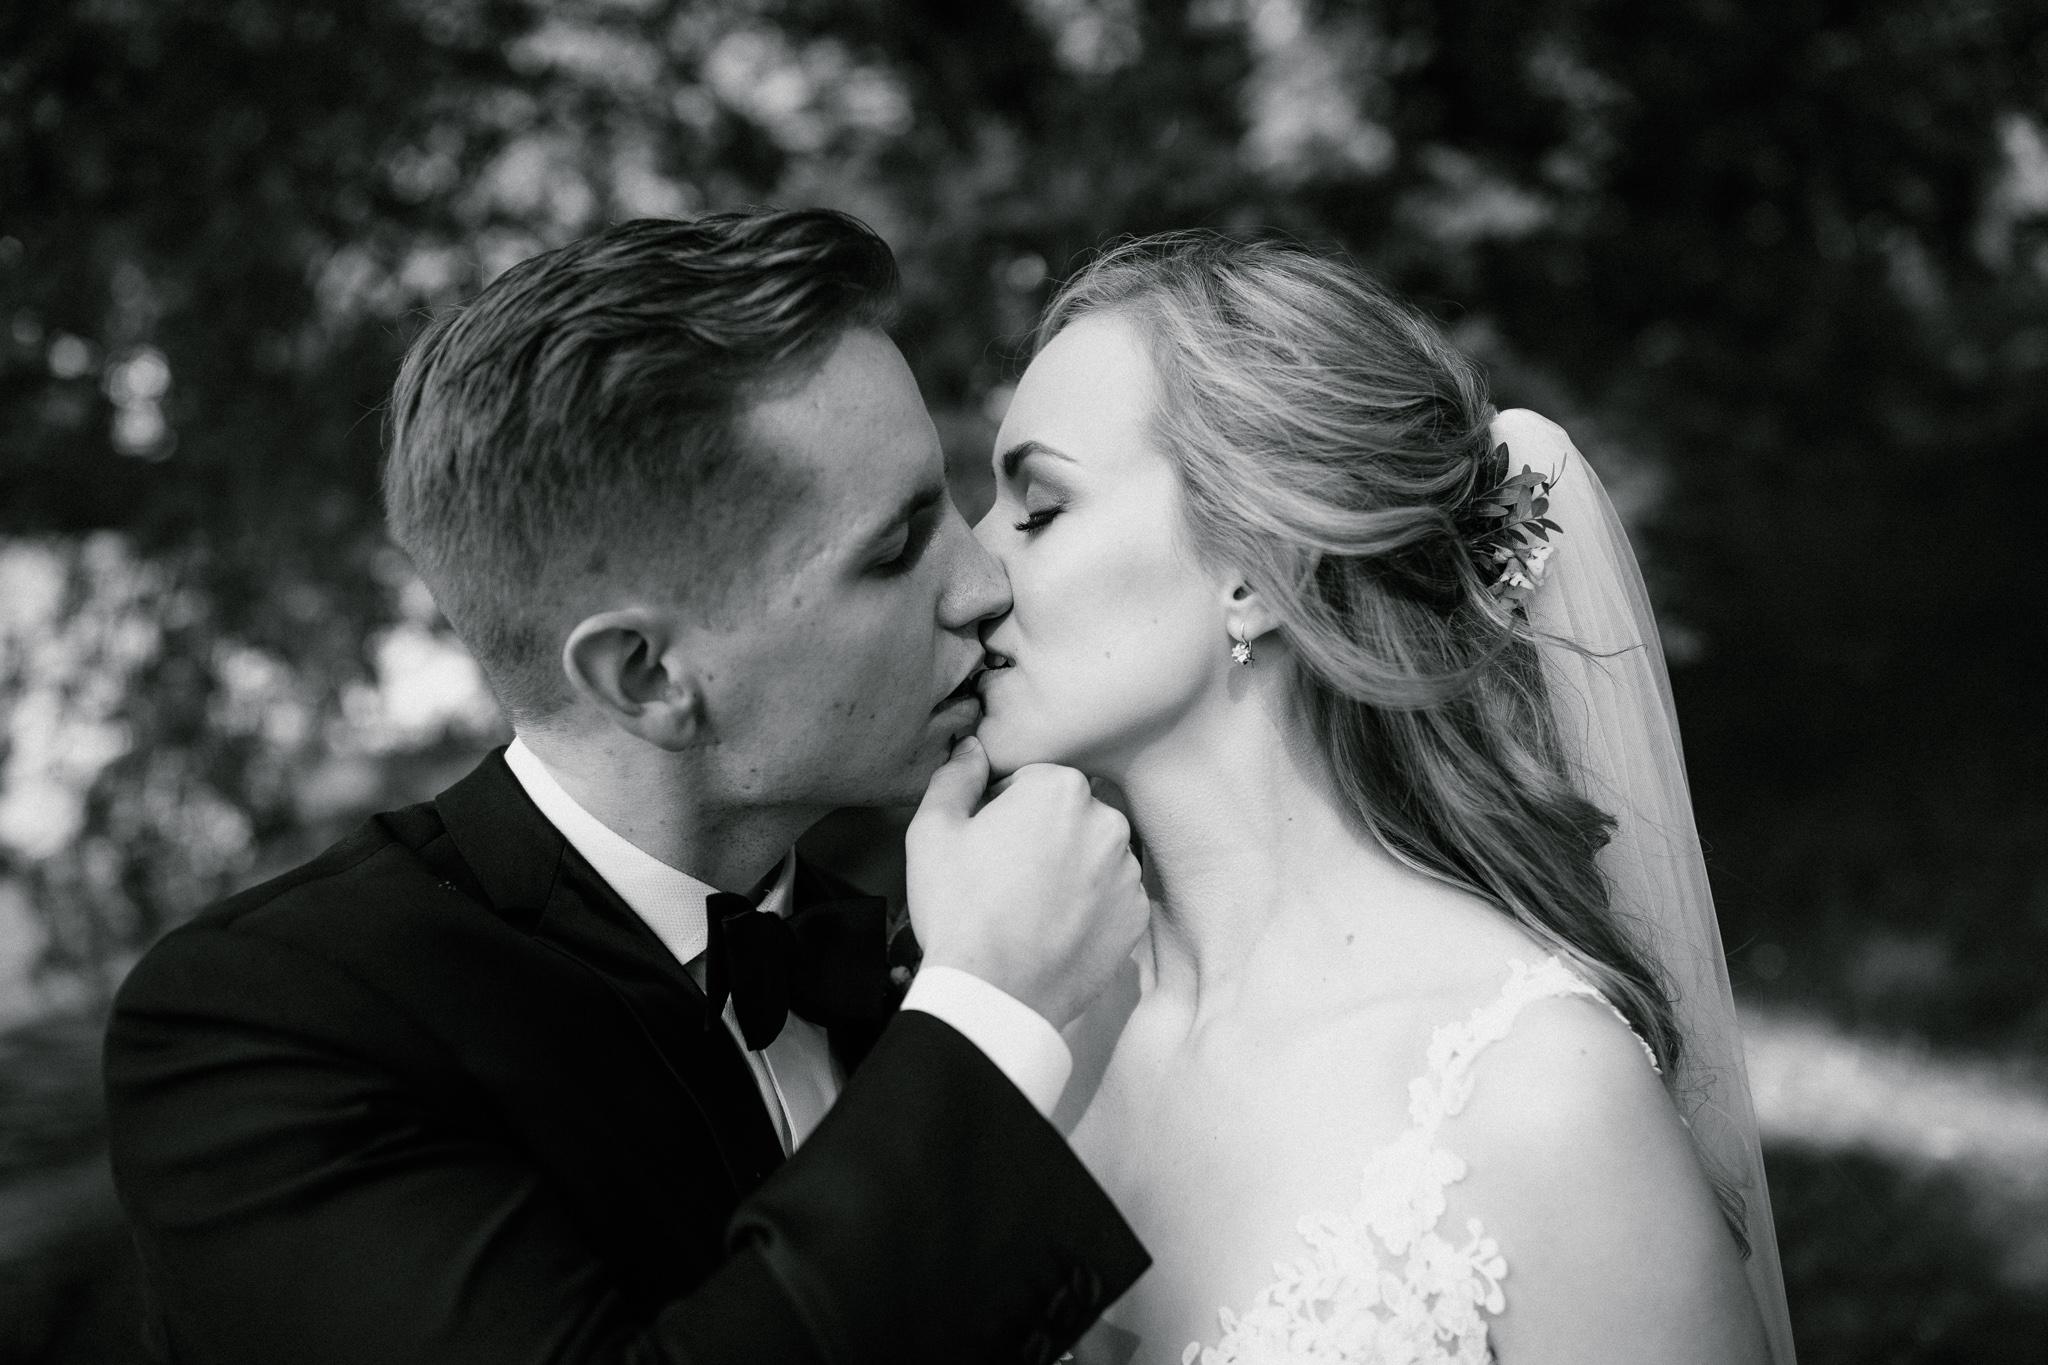 Johanna + Mikko - Tampere - Photo by Patrick Karkkolainen Wedding Photographer-38.jpg